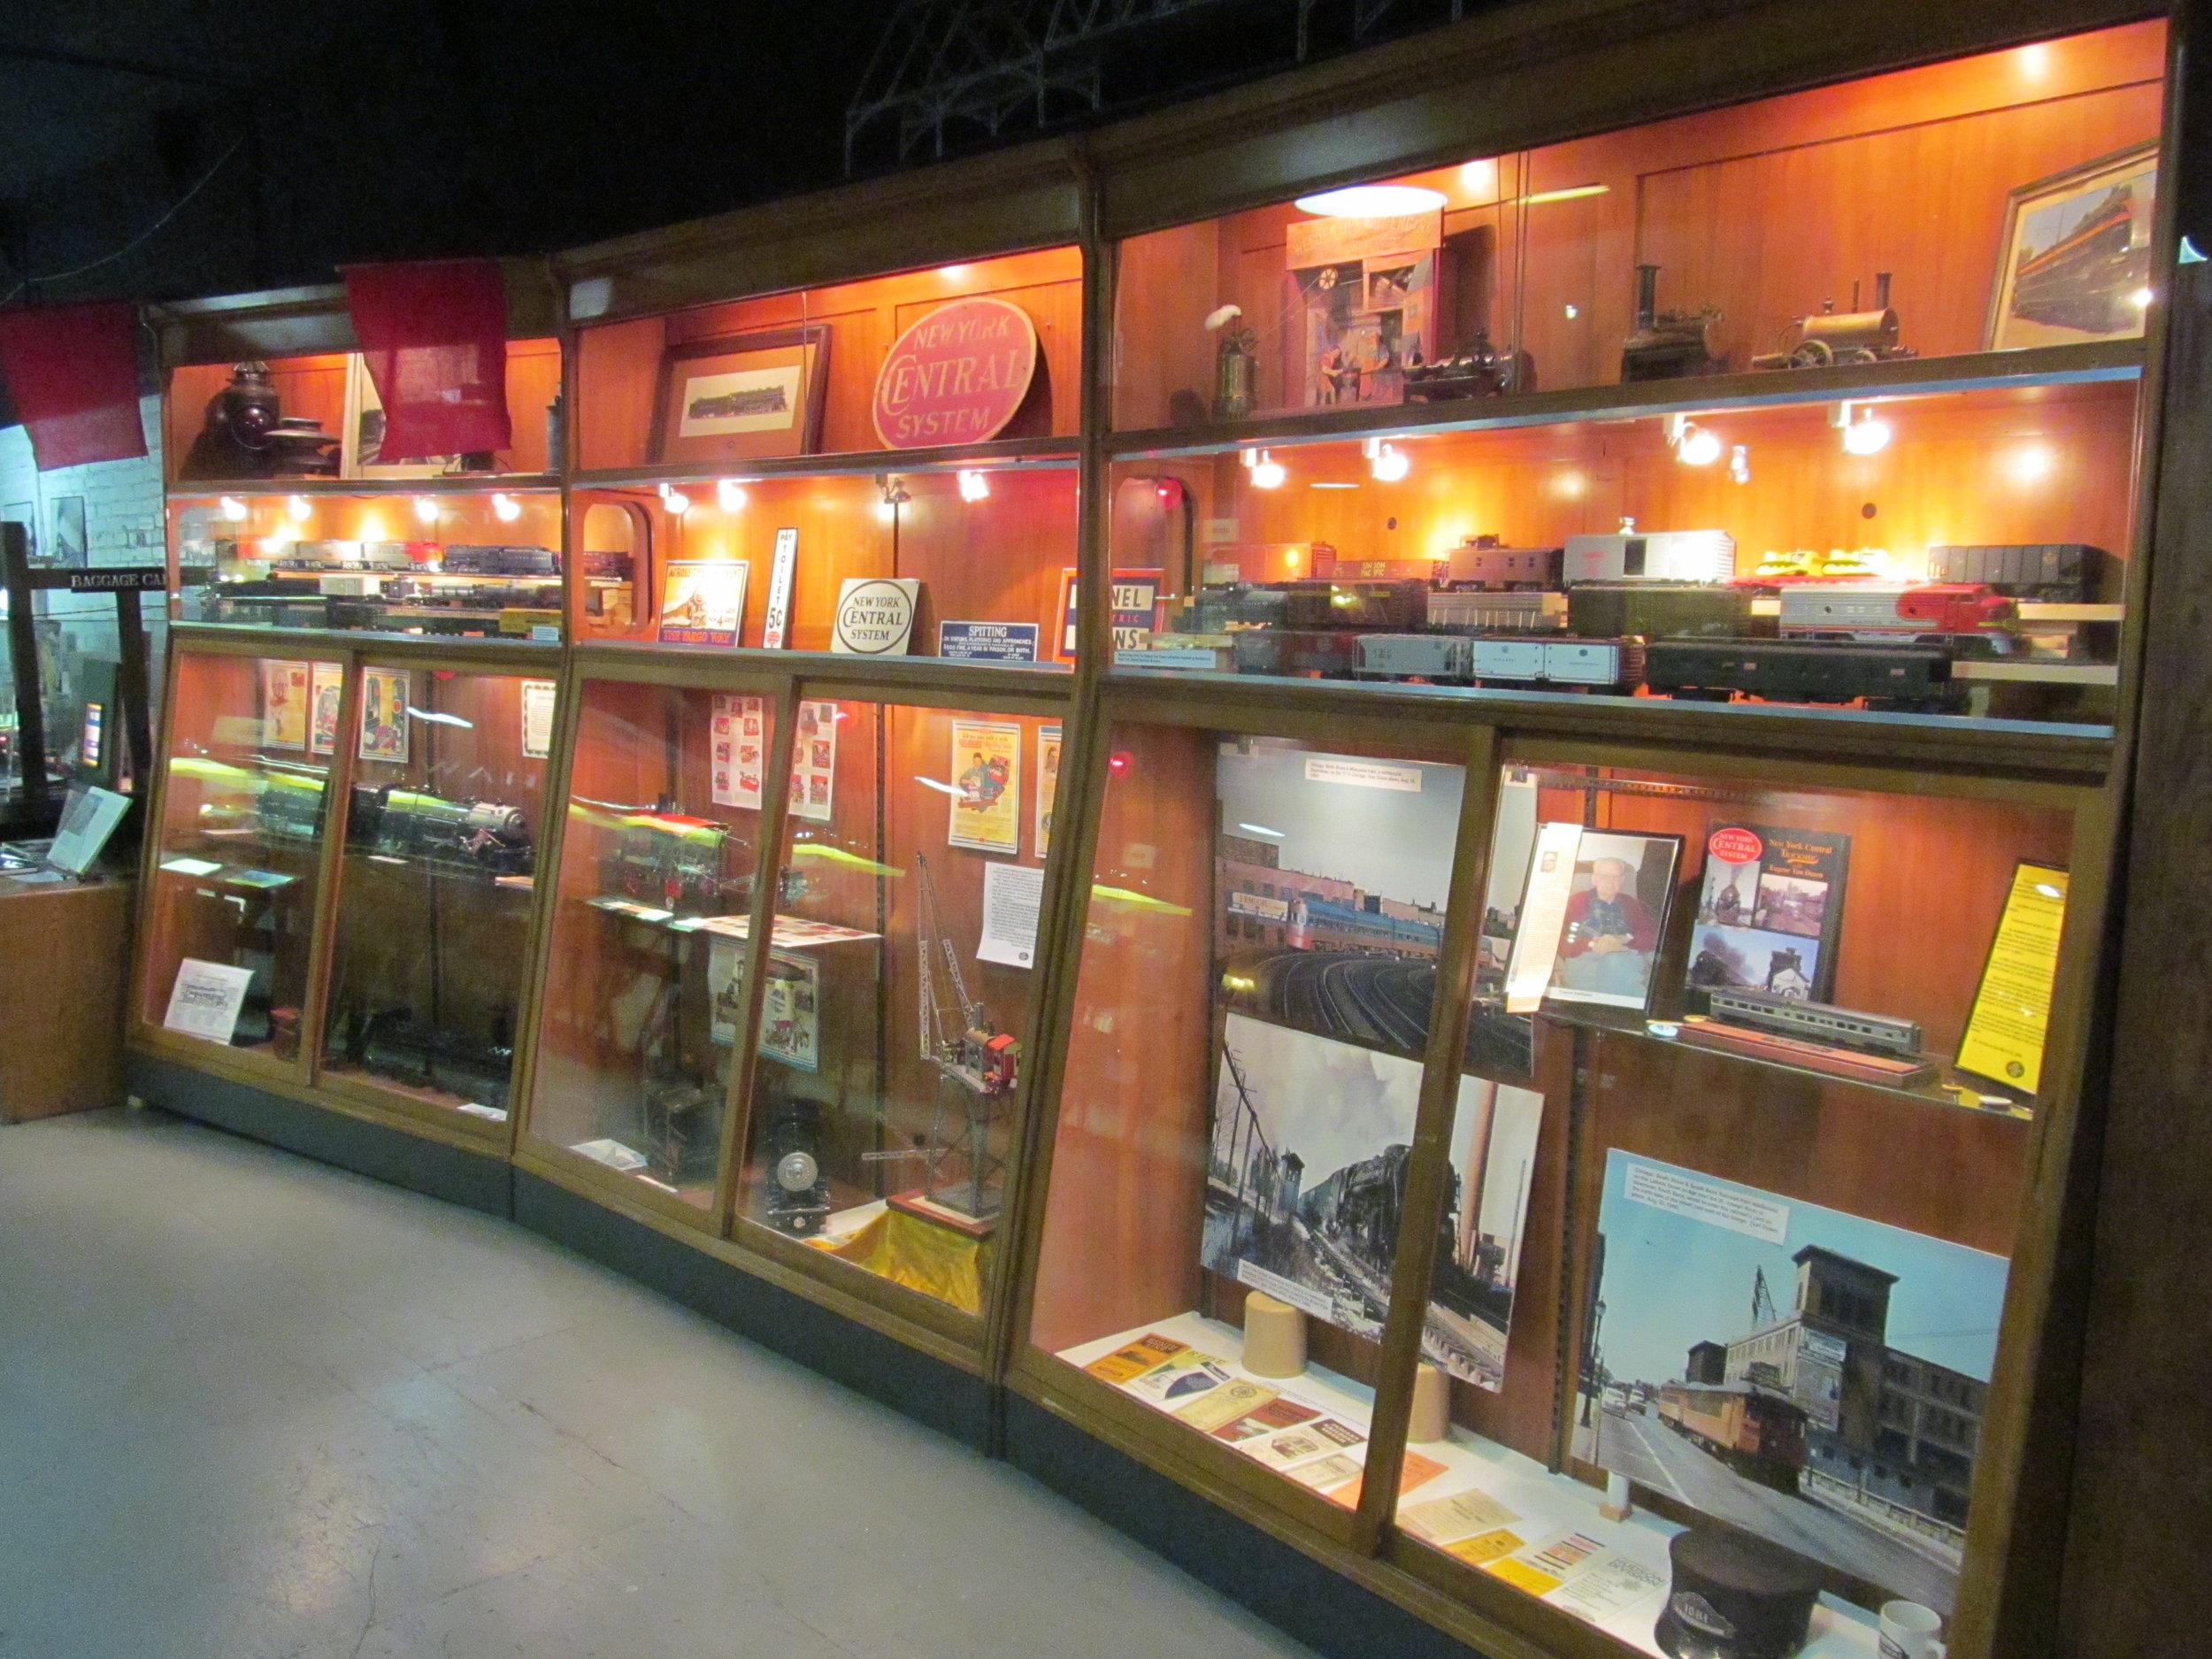 museum exhibit hall.jpg